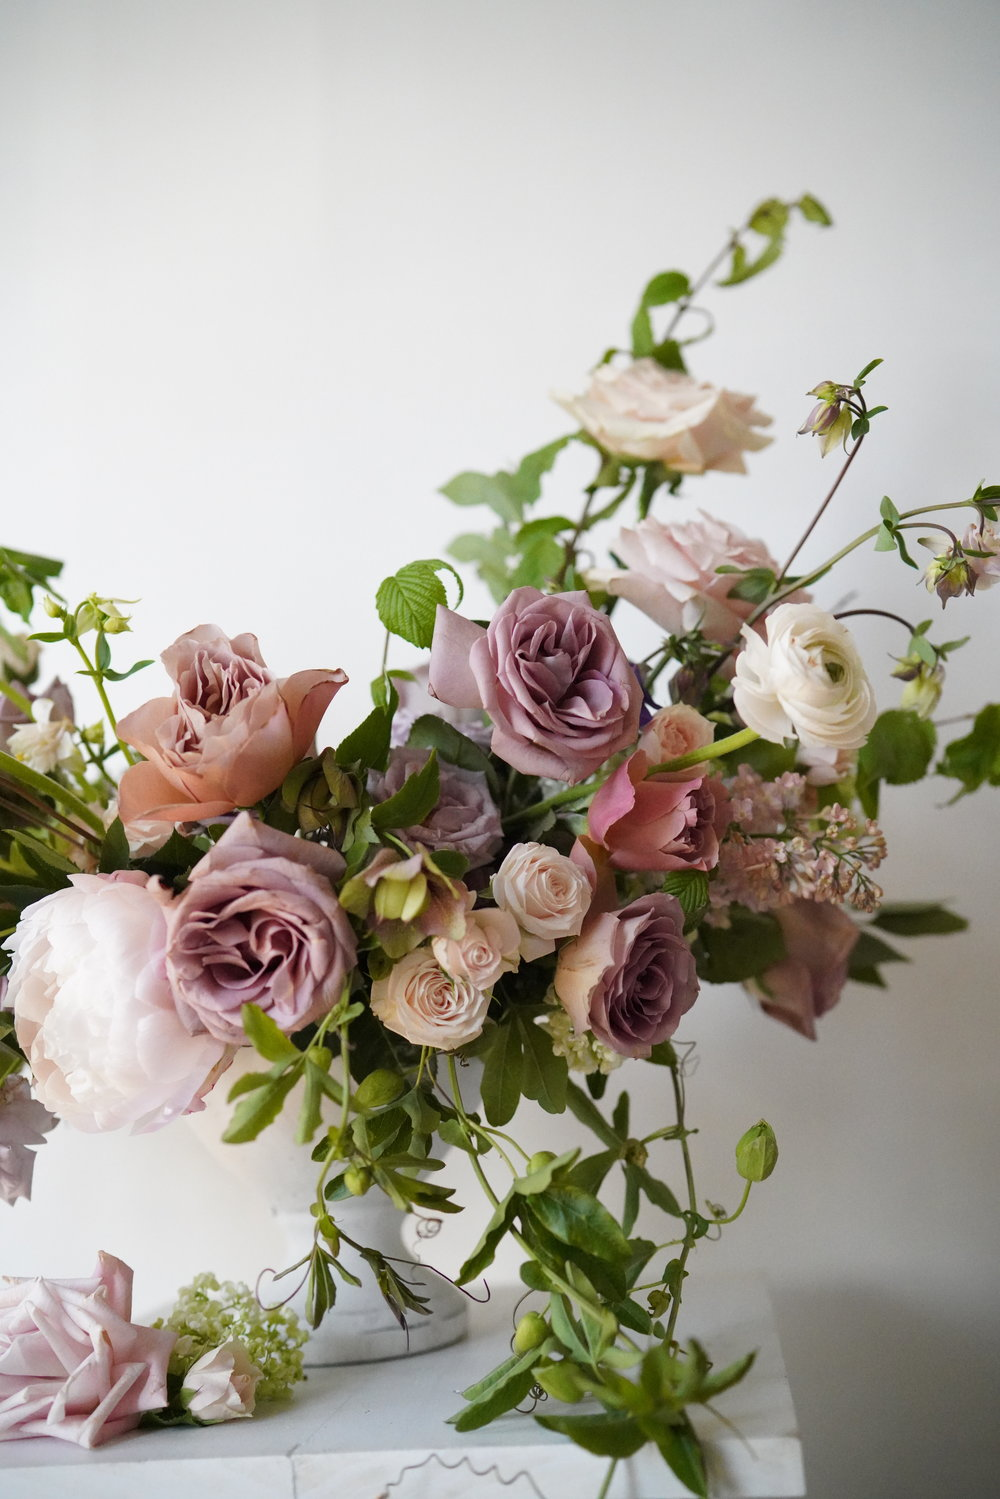 ar7iii_Houston_Photographer_Maxit_Flower_Design.JPG